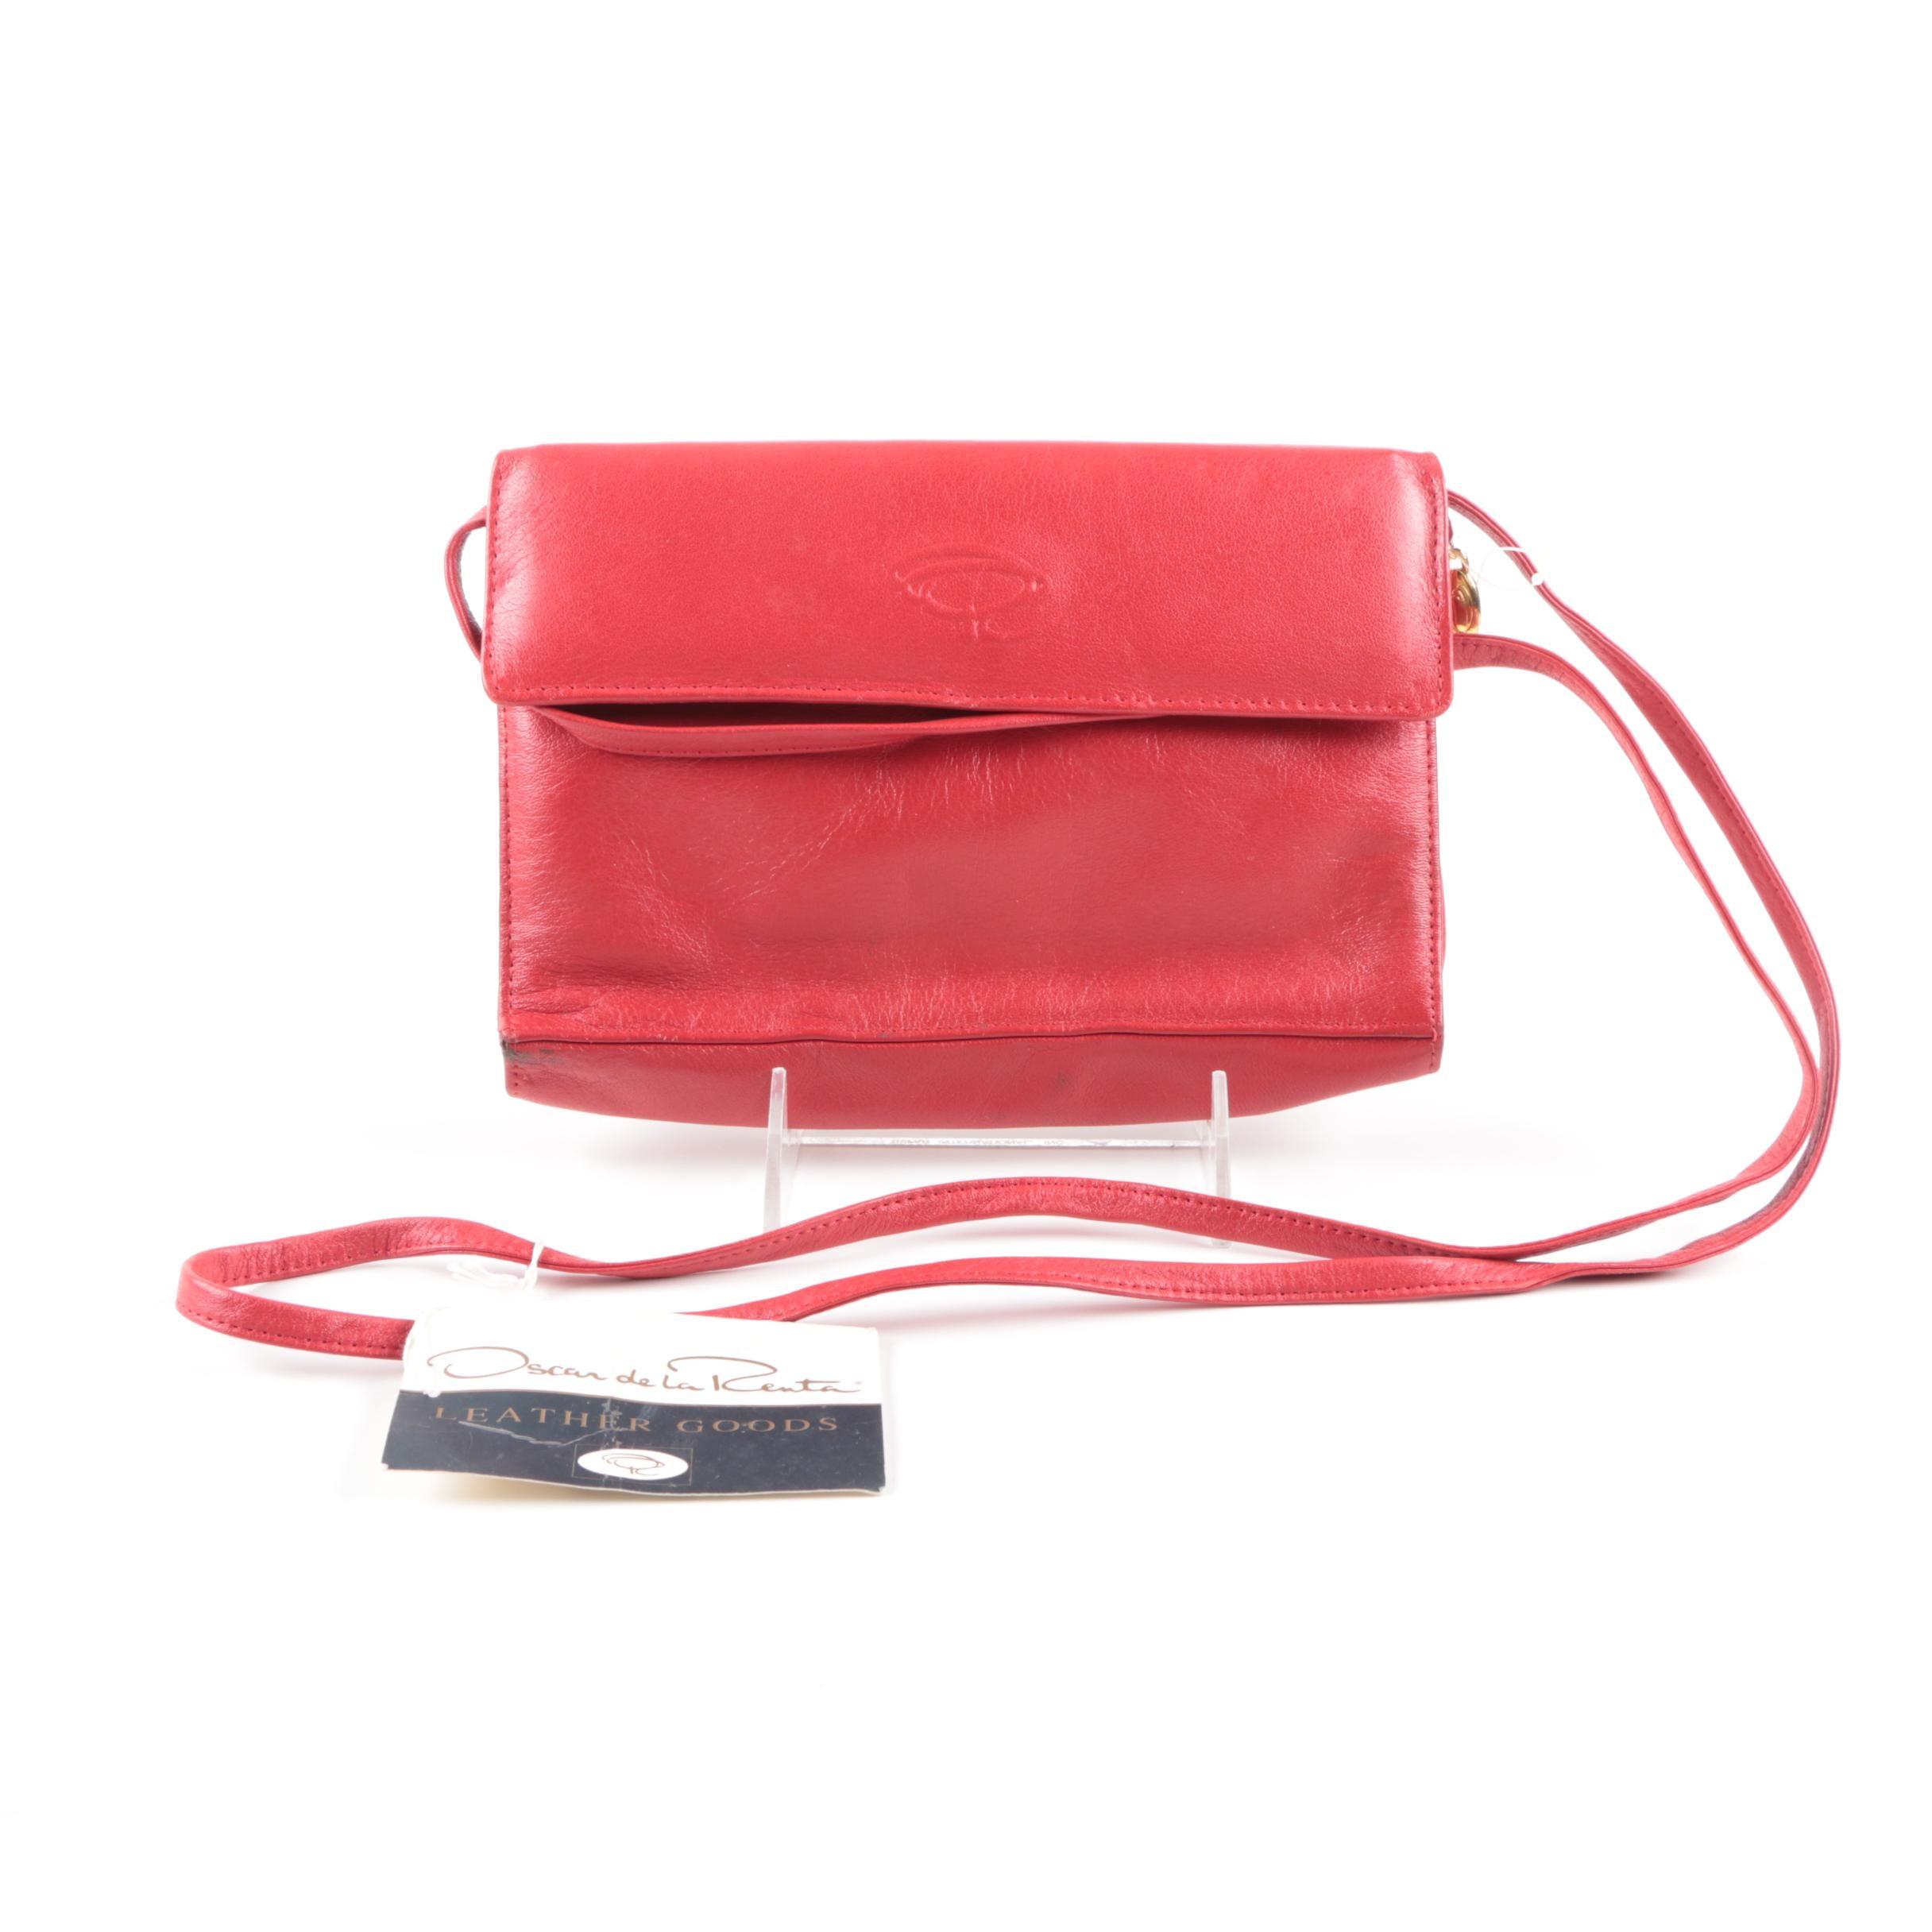 Oscar de la Renta Red Leather Crossbody Bag